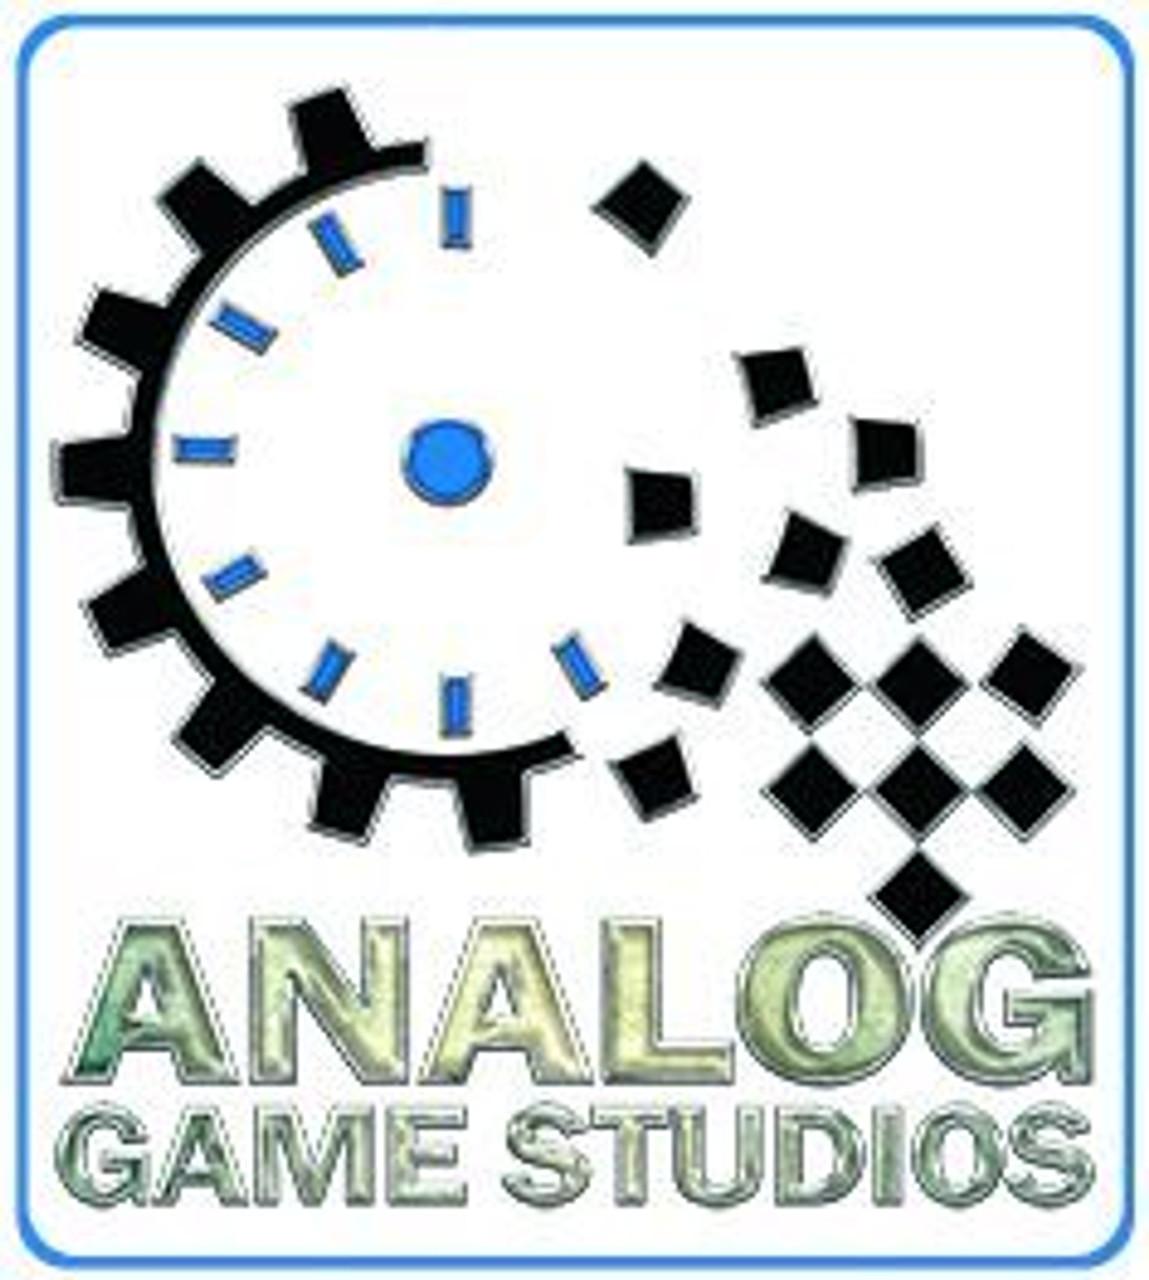 Analog Games Studios